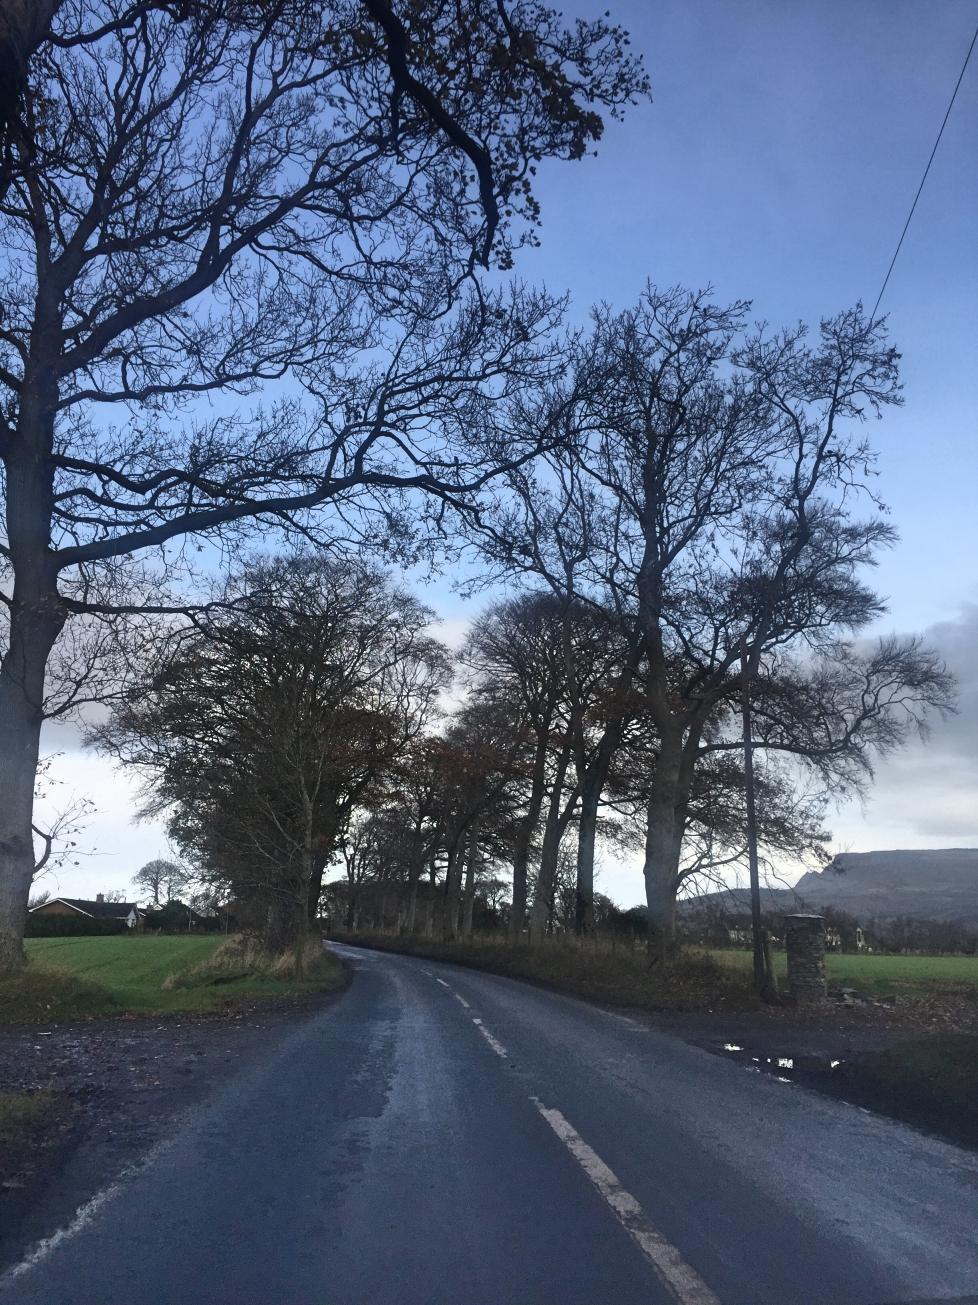 limavady_roe_park_niexplorer_ni_explorer_northern_ireland (1).jpg